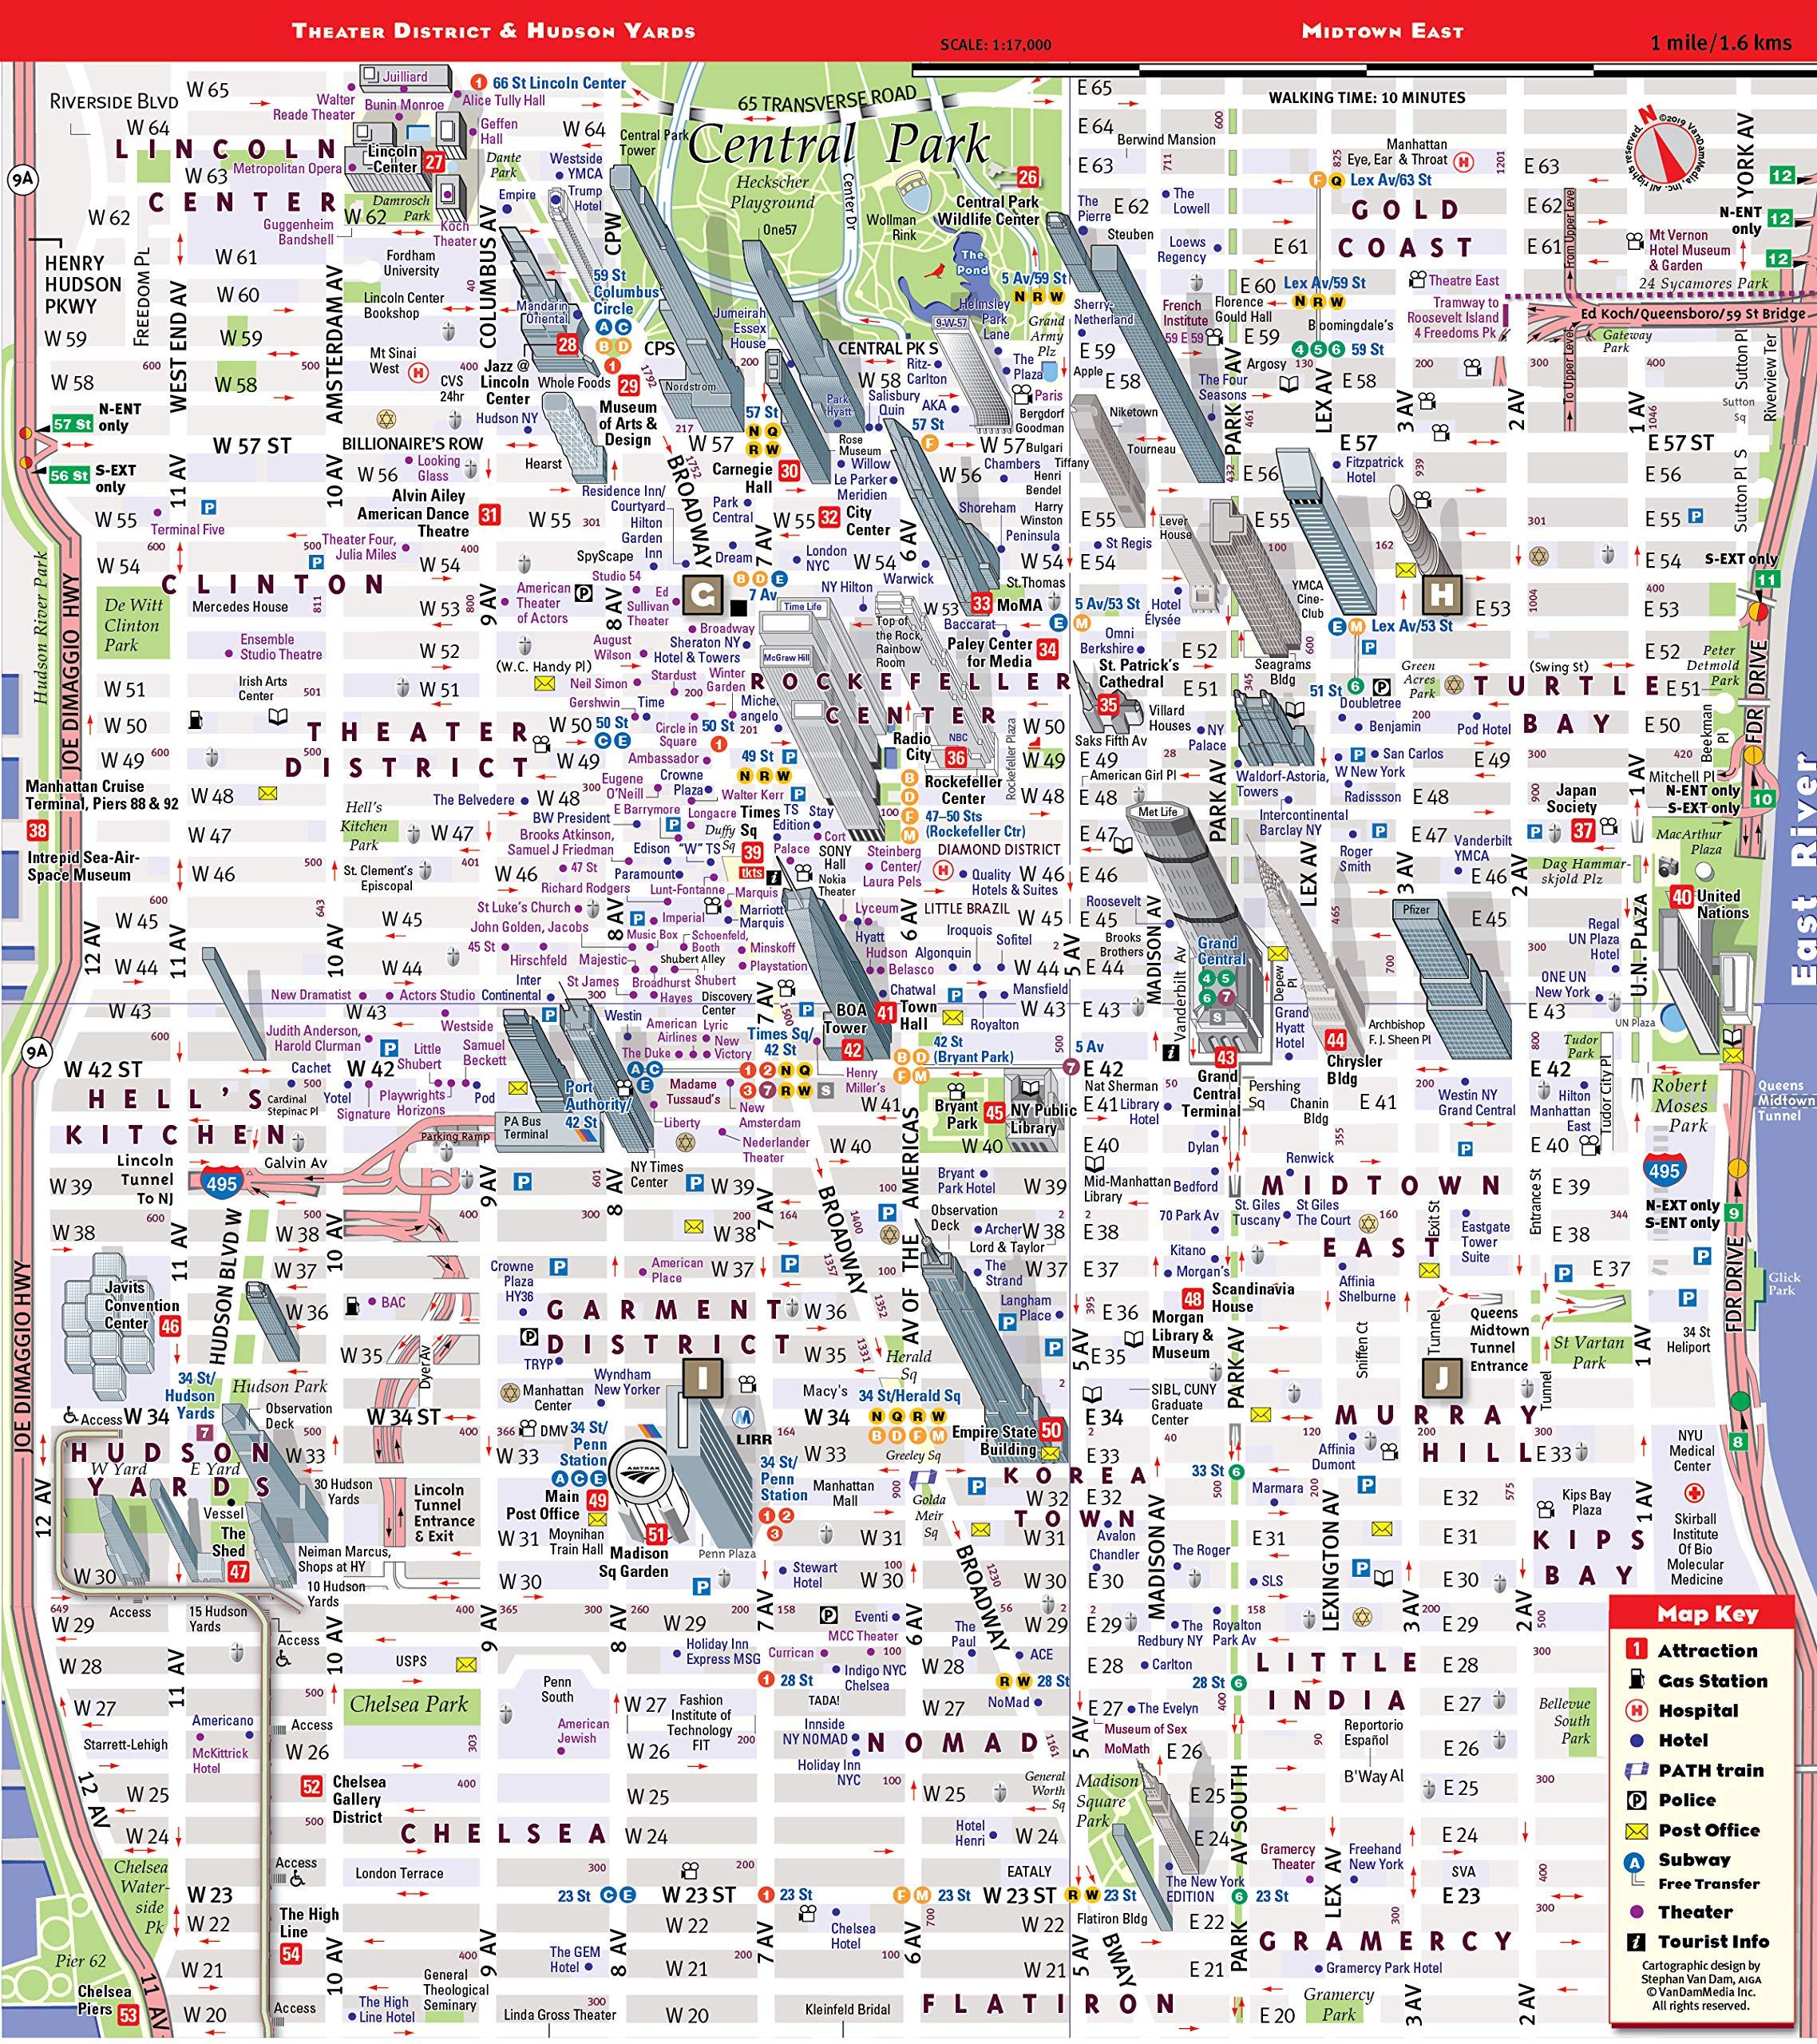 New York Subway Map Hide Head.Streetsmart Nyc Map Midtown Edition By Vandam Laminated Pocket City